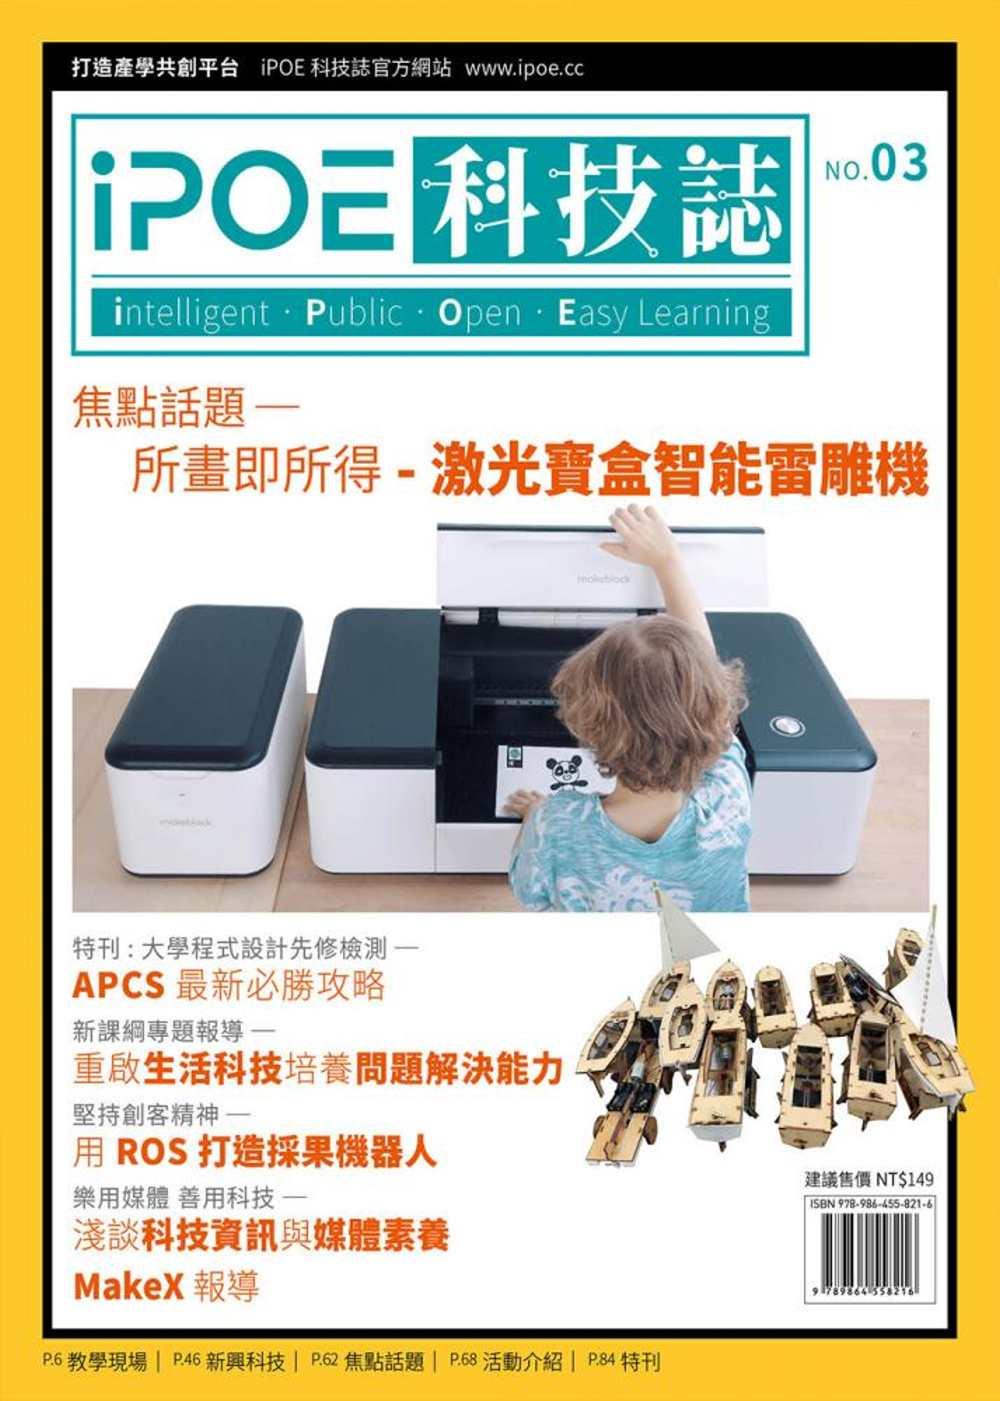 iPOE科技誌03:所畫即所得-激光寶盒智能雷雕機